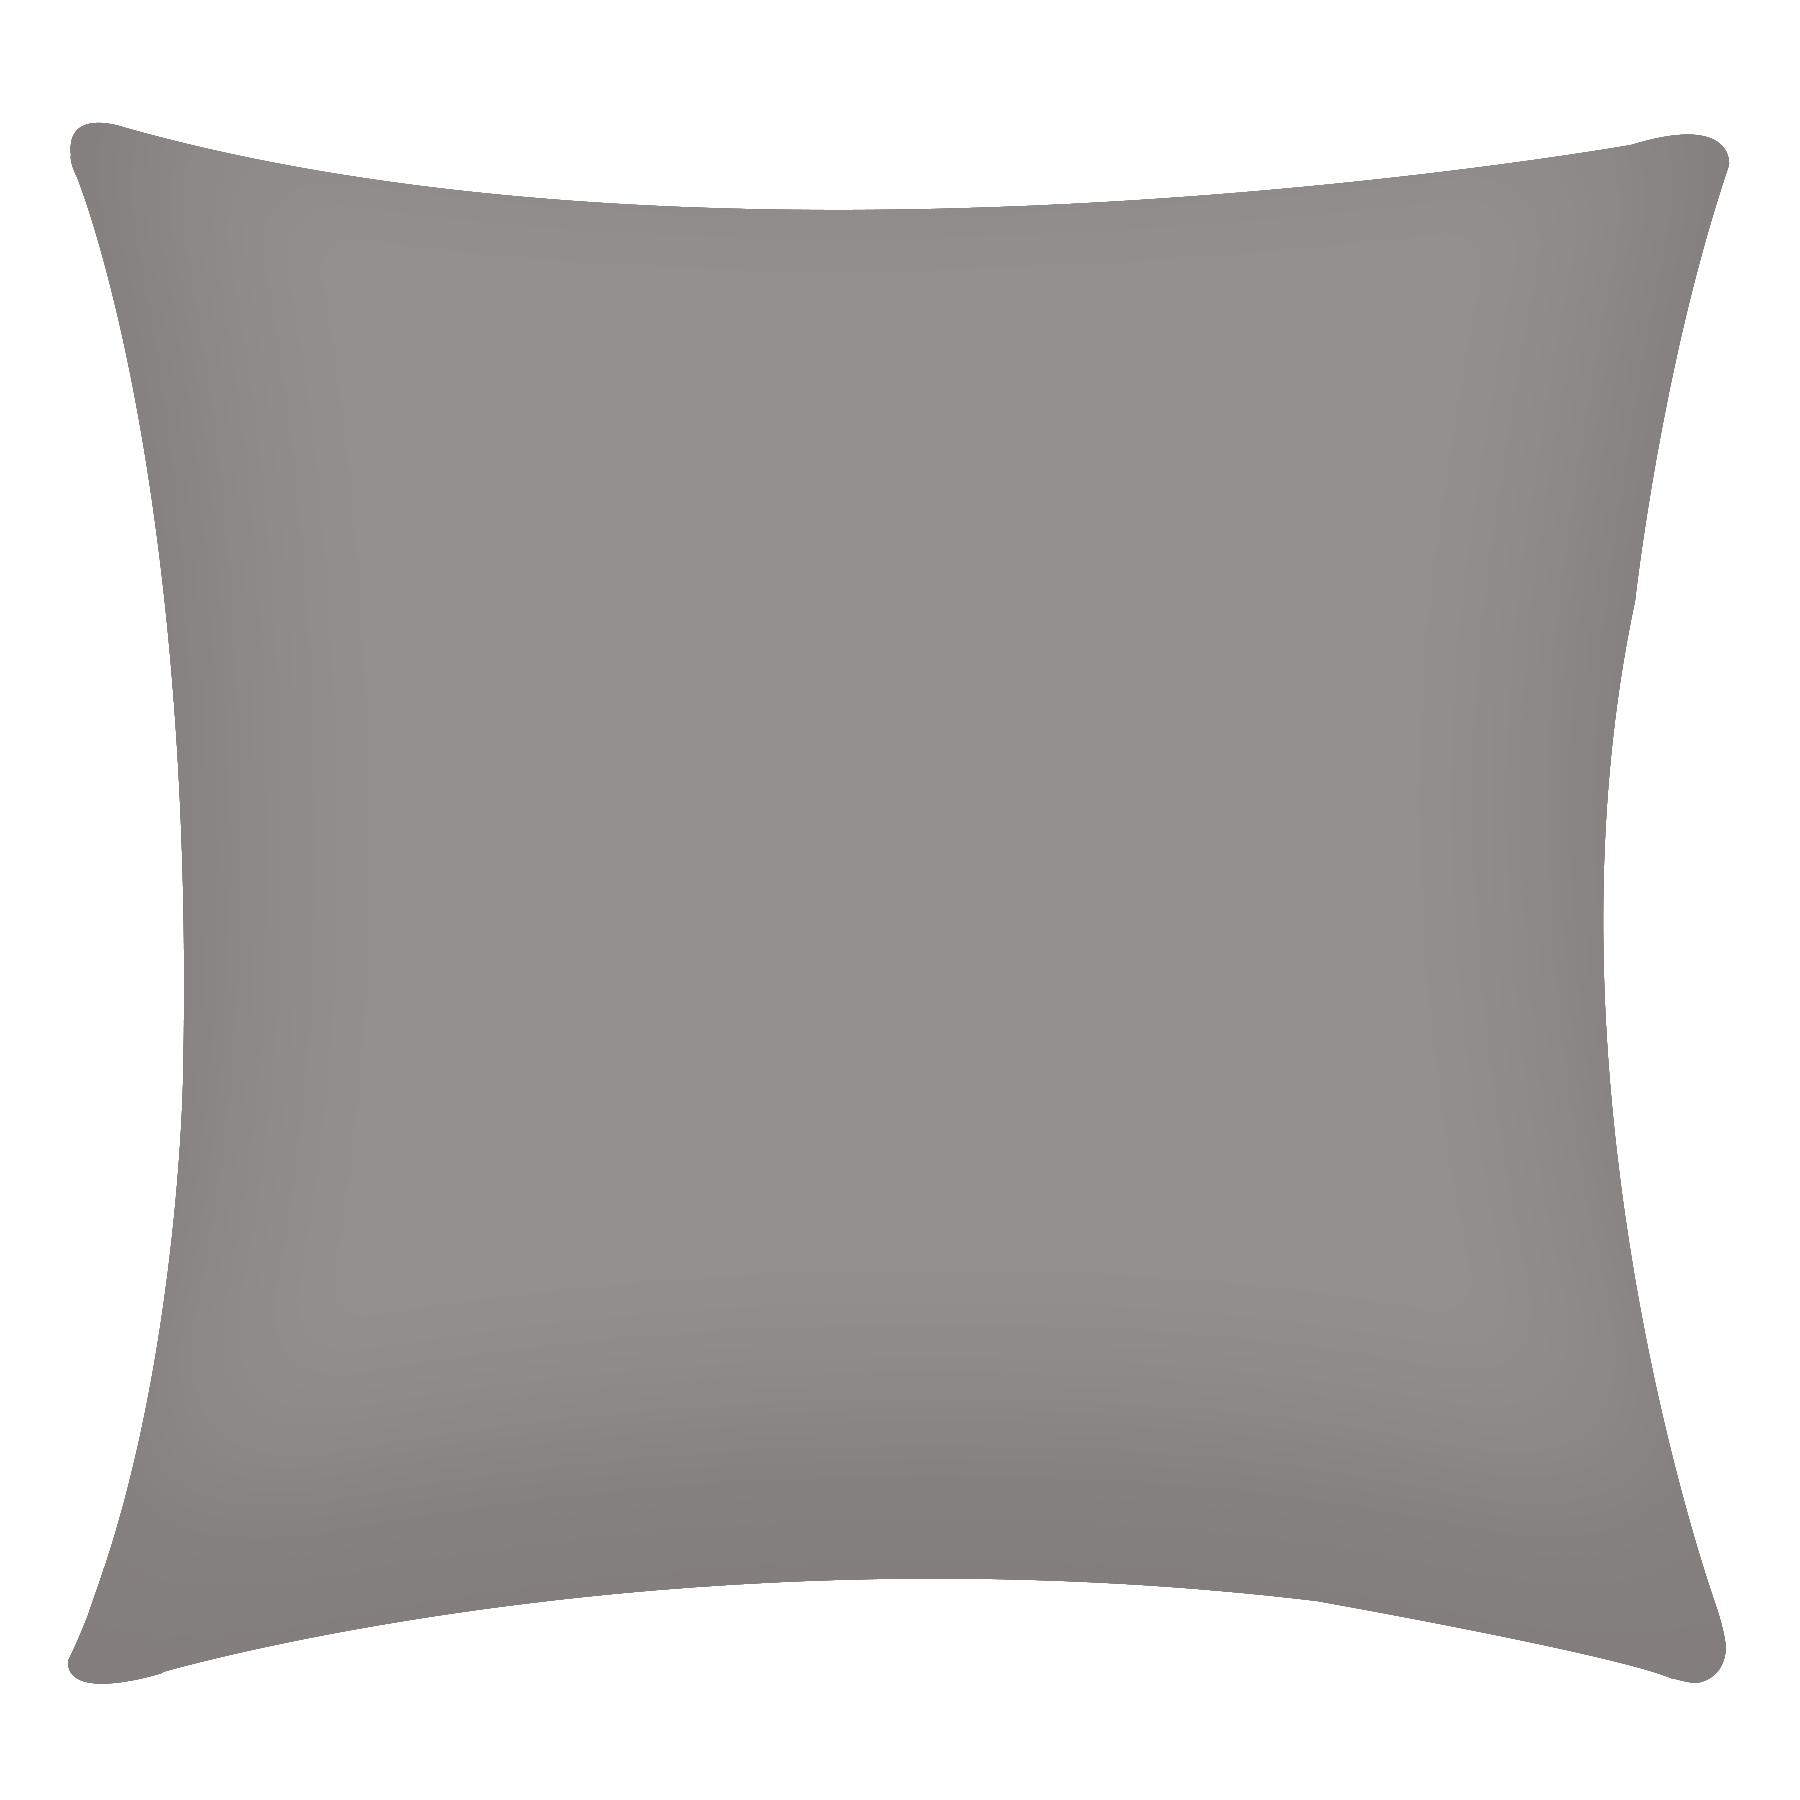 baumwolle kissenbezug kissenh lle sofakissen kopfkissen. Black Bedroom Furniture Sets. Home Design Ideas